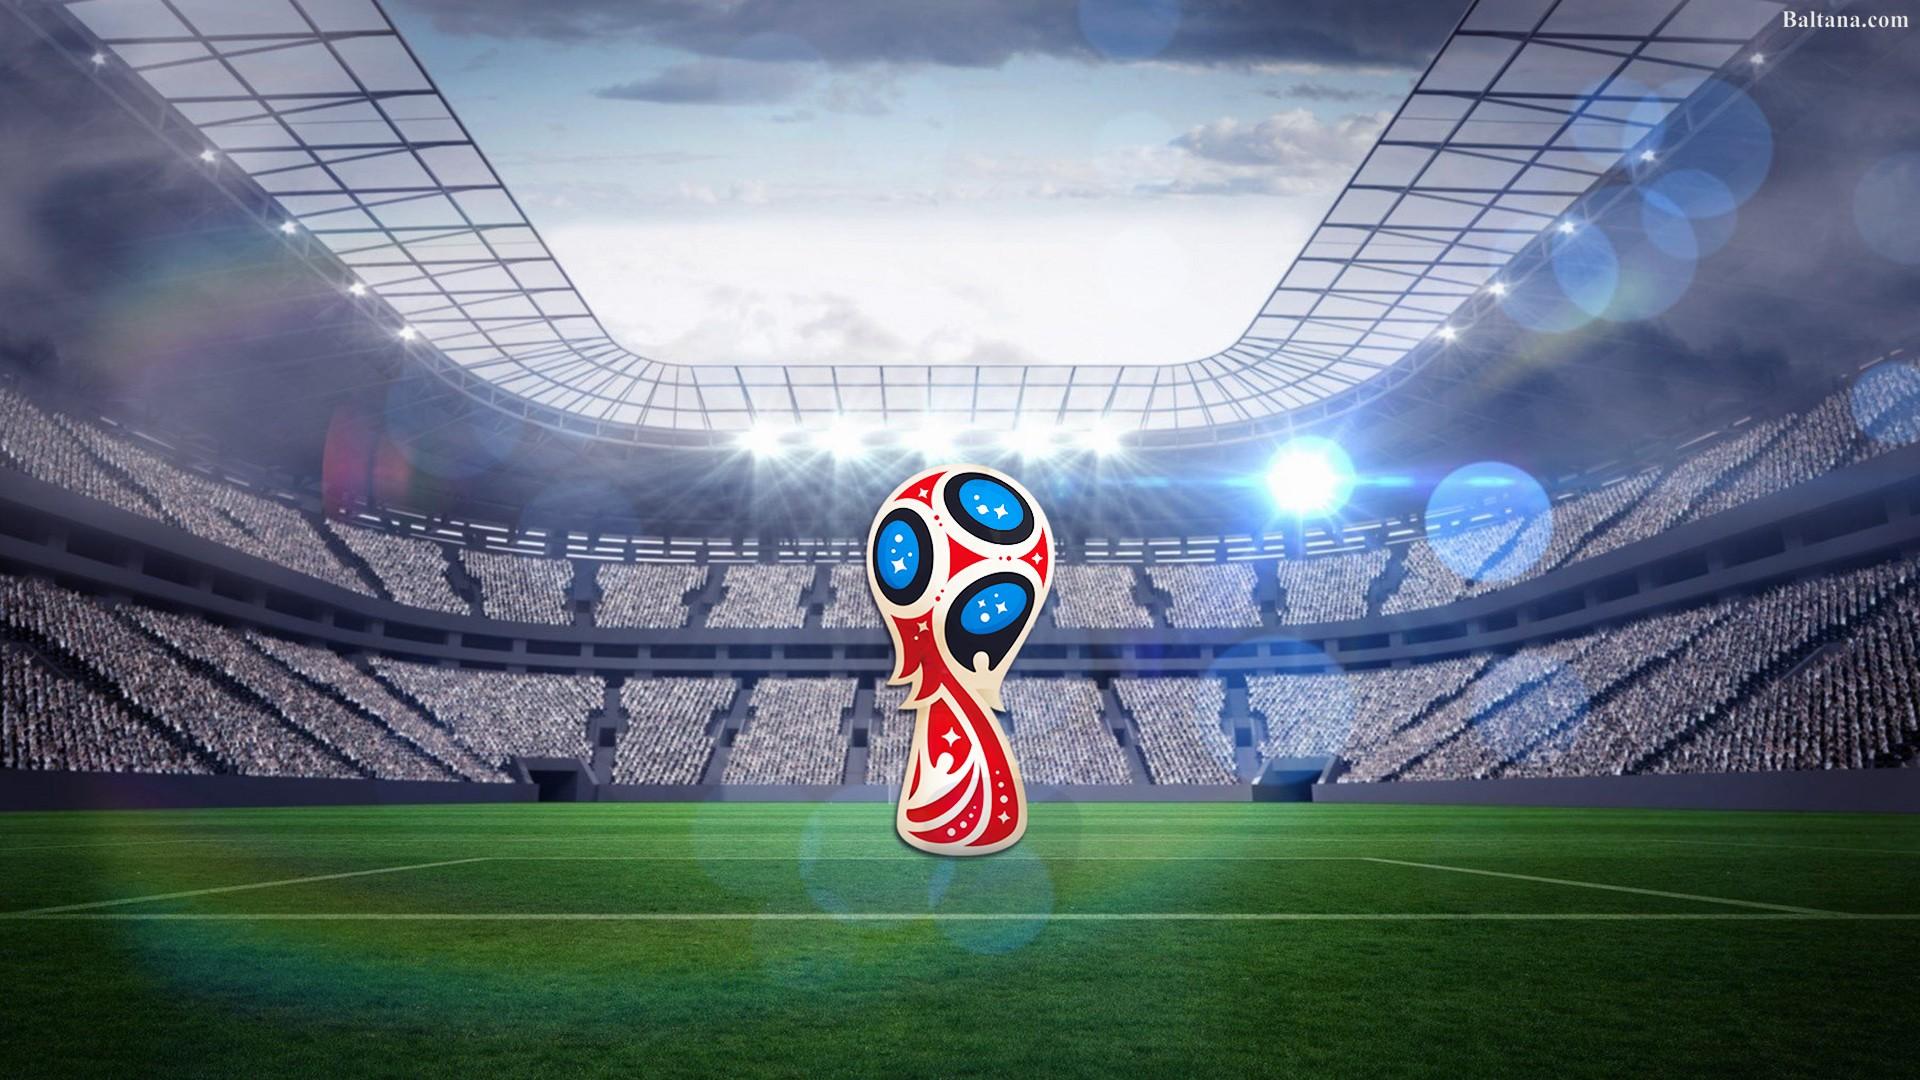 Free Download 2018 Fifa World Cup Logo Wallpaper 34007 Baltana